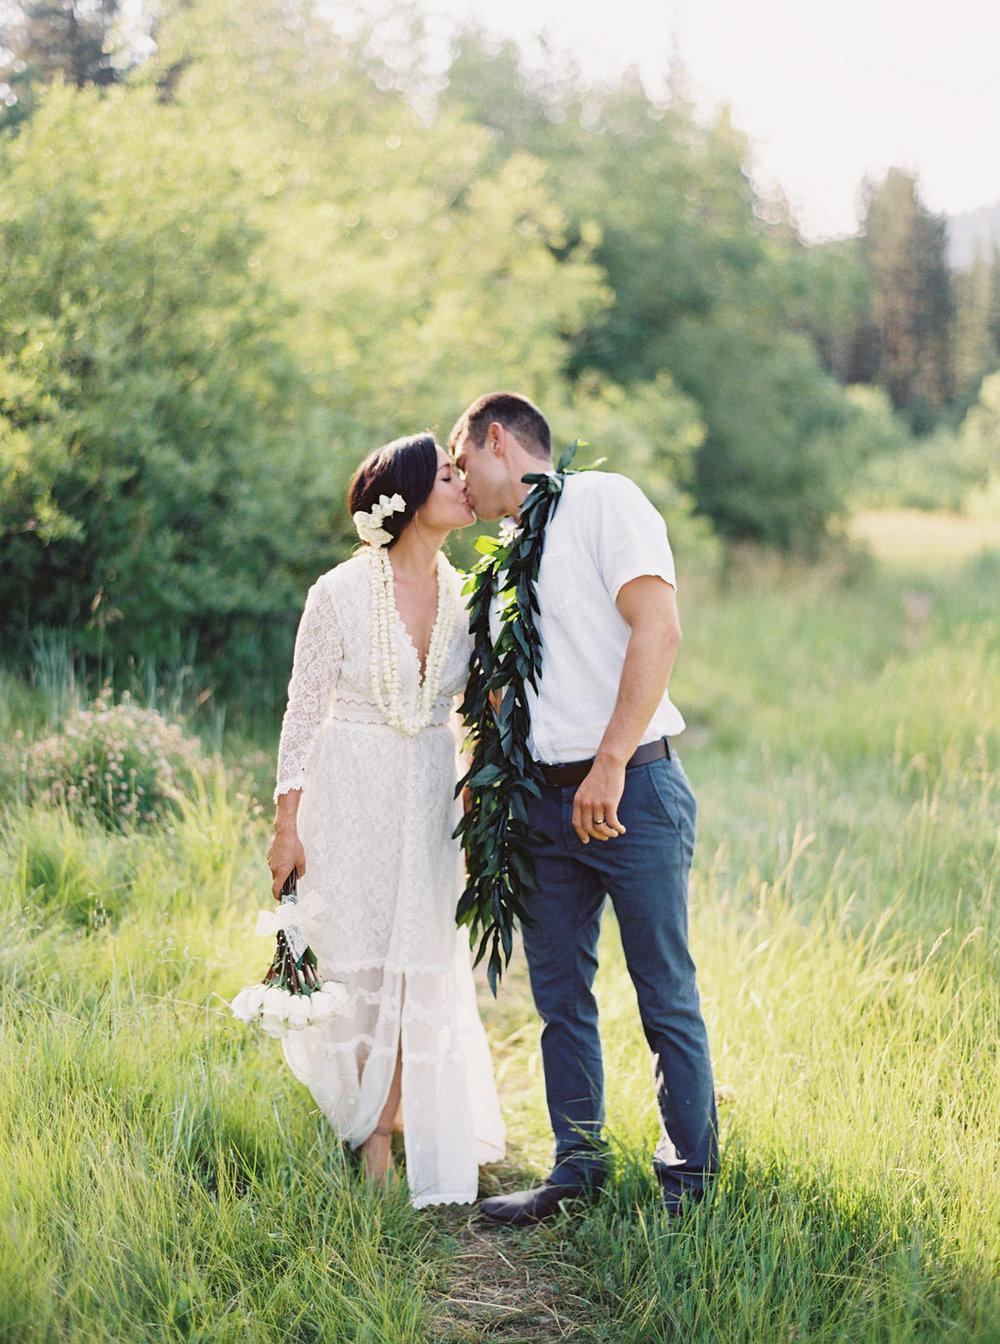 000033_gallardo_wedding_film0098.jpg